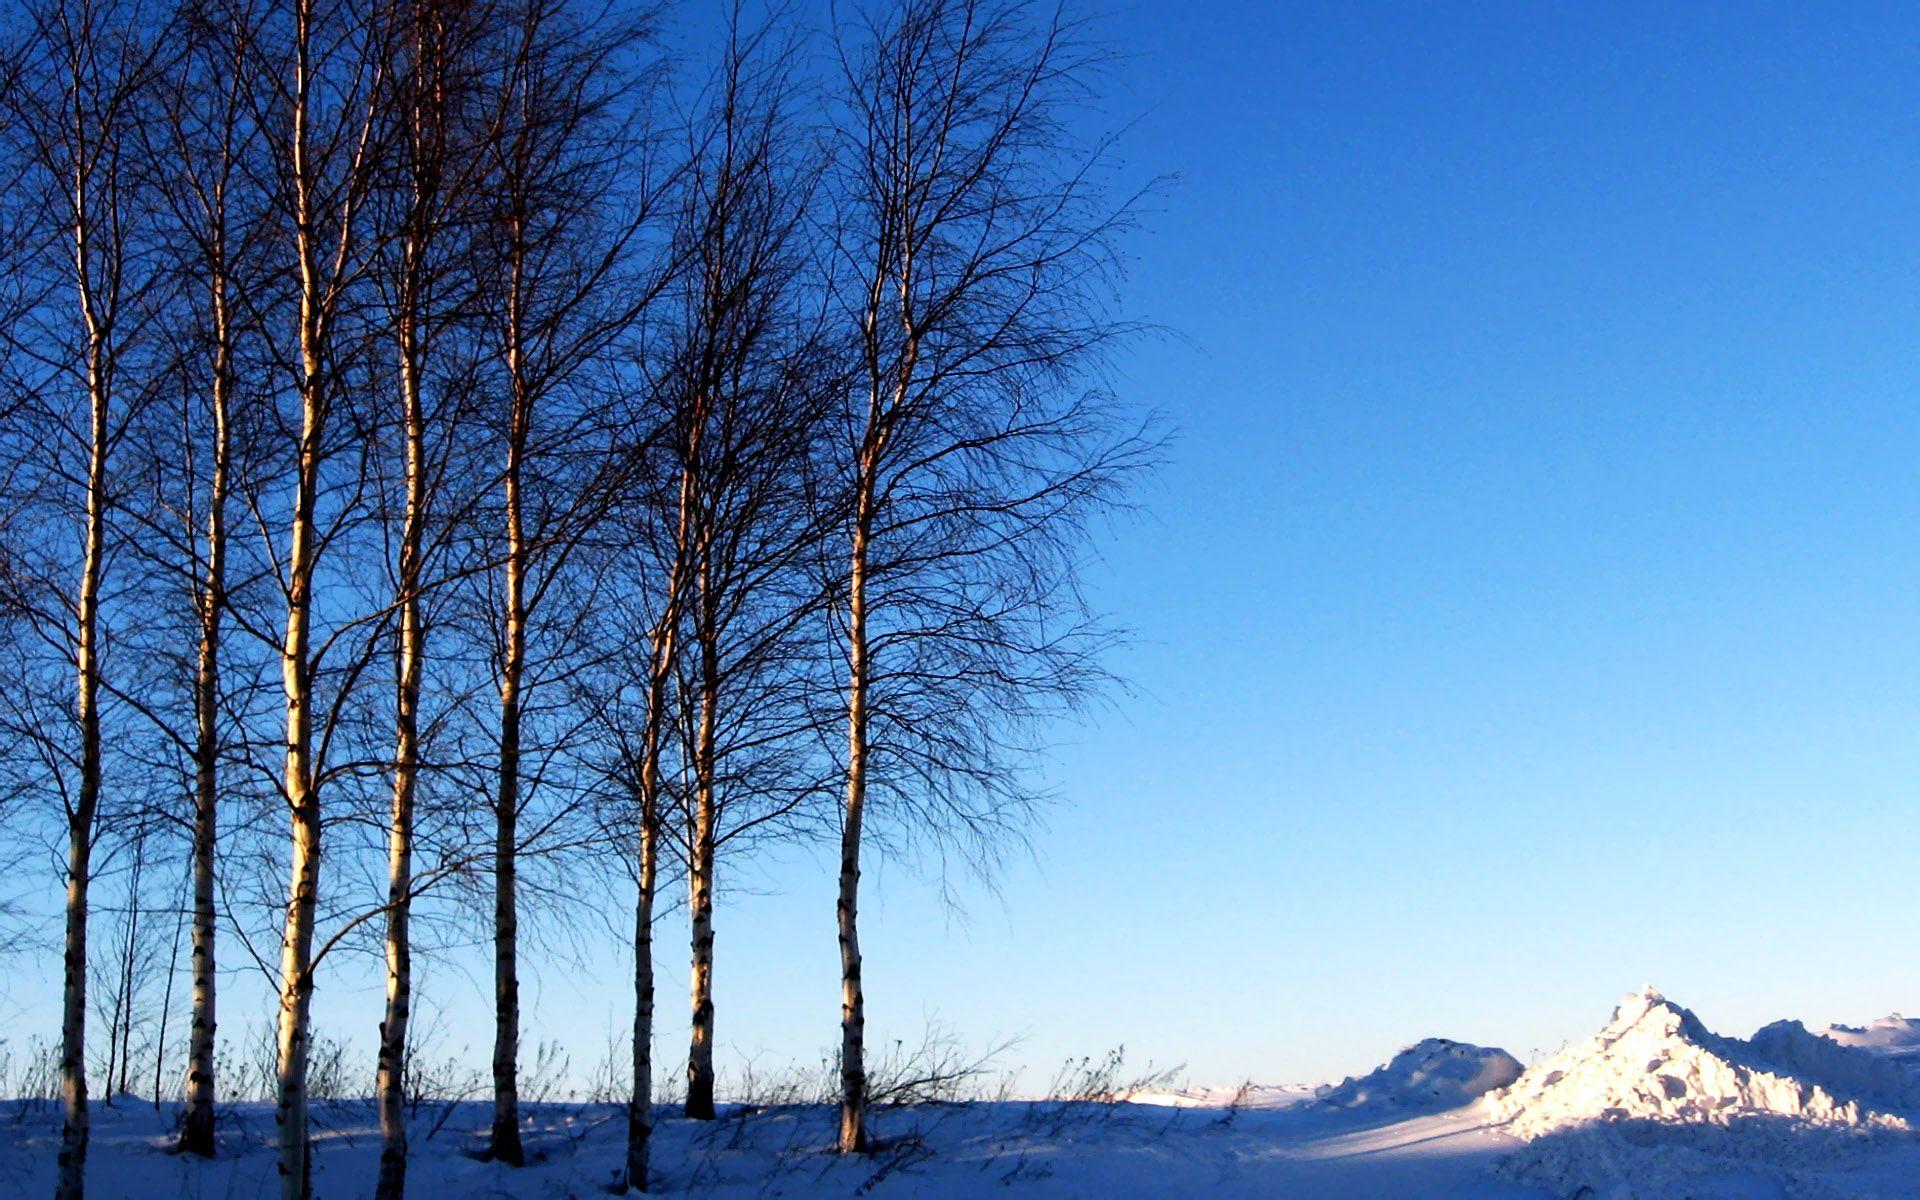 High Resolution Winter Snow Winter Snow Scenes Dreamy Winter Snow Wallpaper High Resolution Winter Snow Wallpaper Blue Sky Wallpaper Snow Scenes